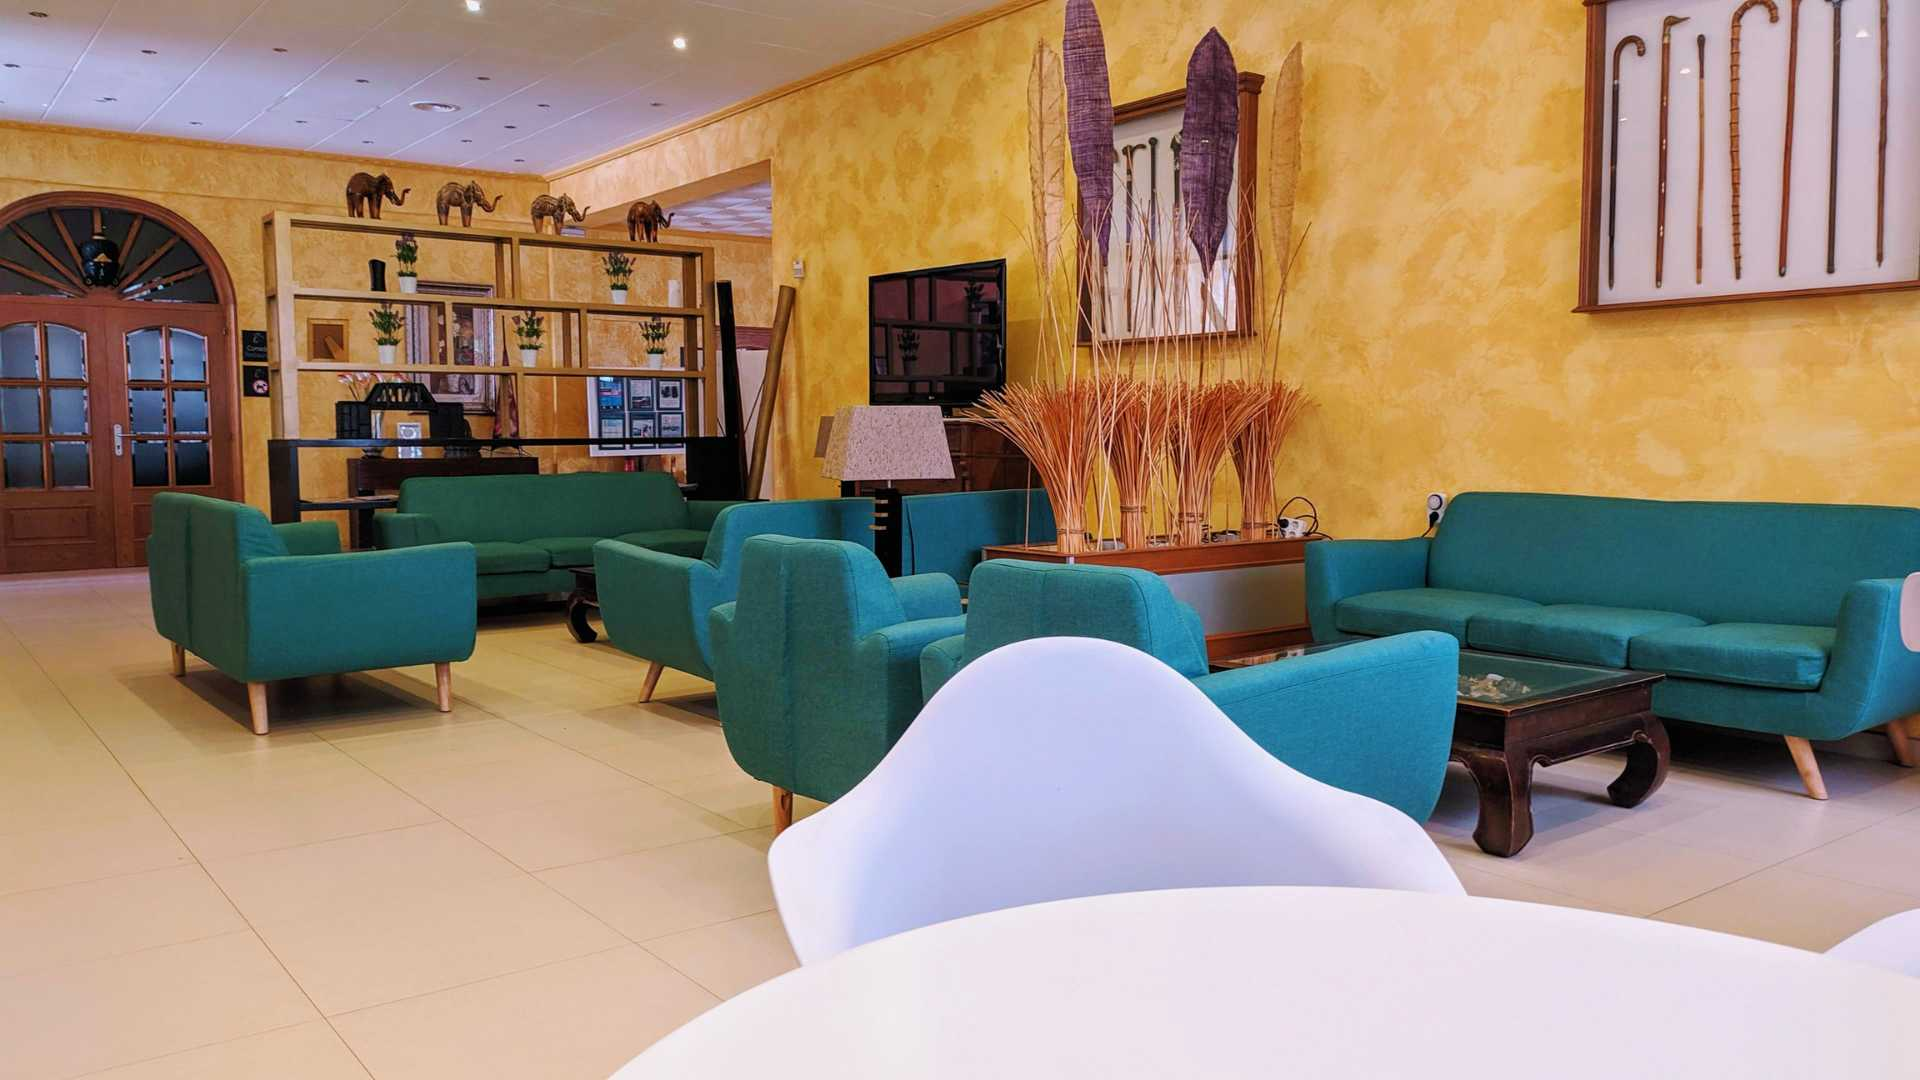 hotel montreal in benicasim castellon,